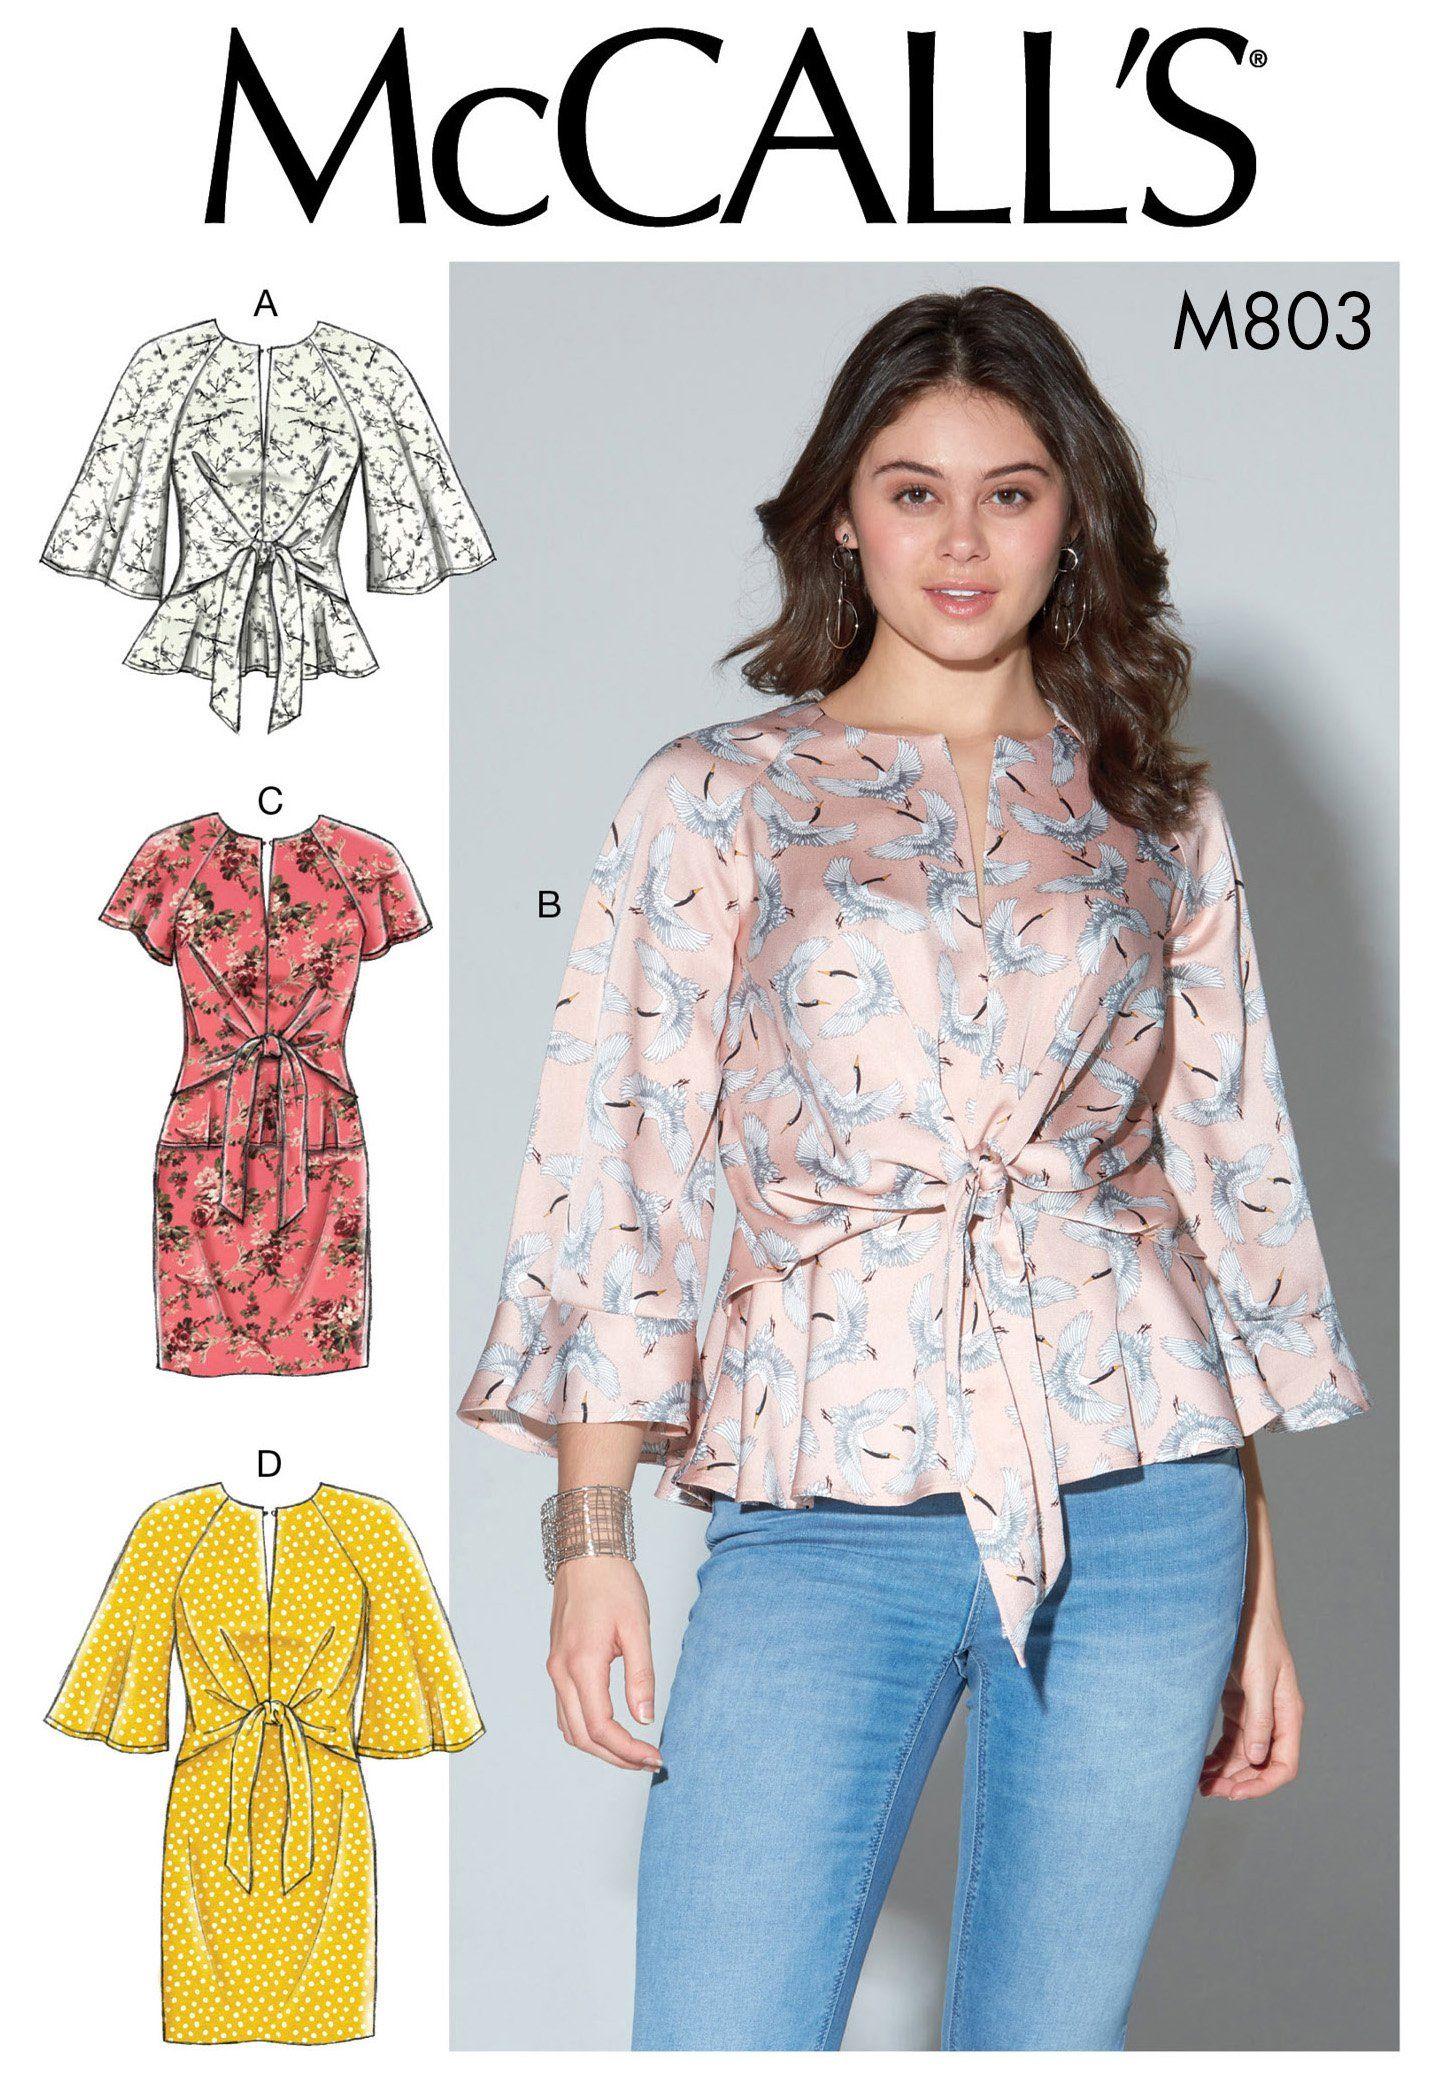 f310cdcd0 McCall's 7803 Misses' Tops and Dresses | X9Q6YS | Dress sewing ...